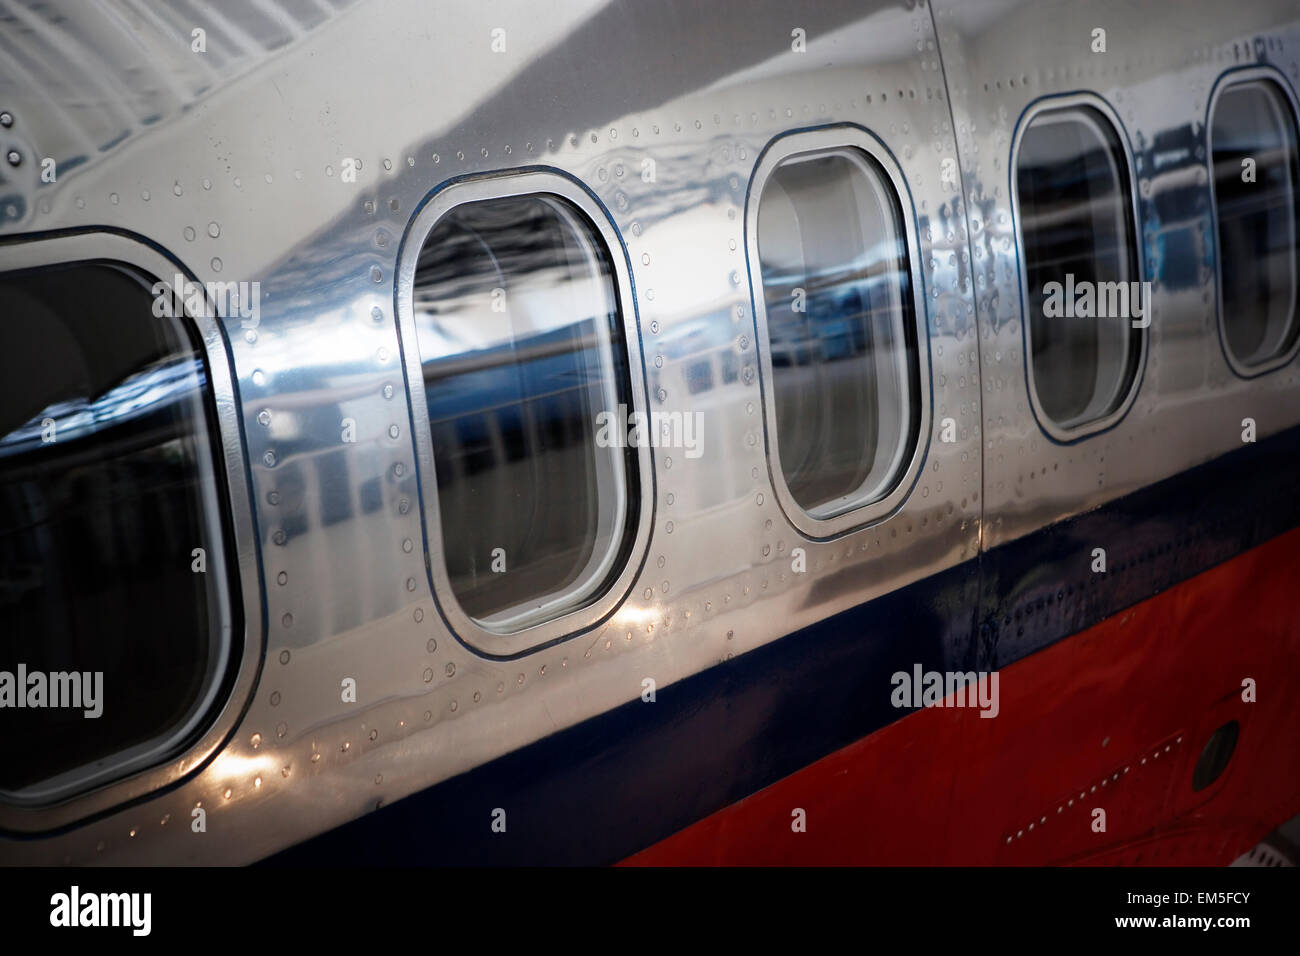 Airplane fuselage. - Stock Image